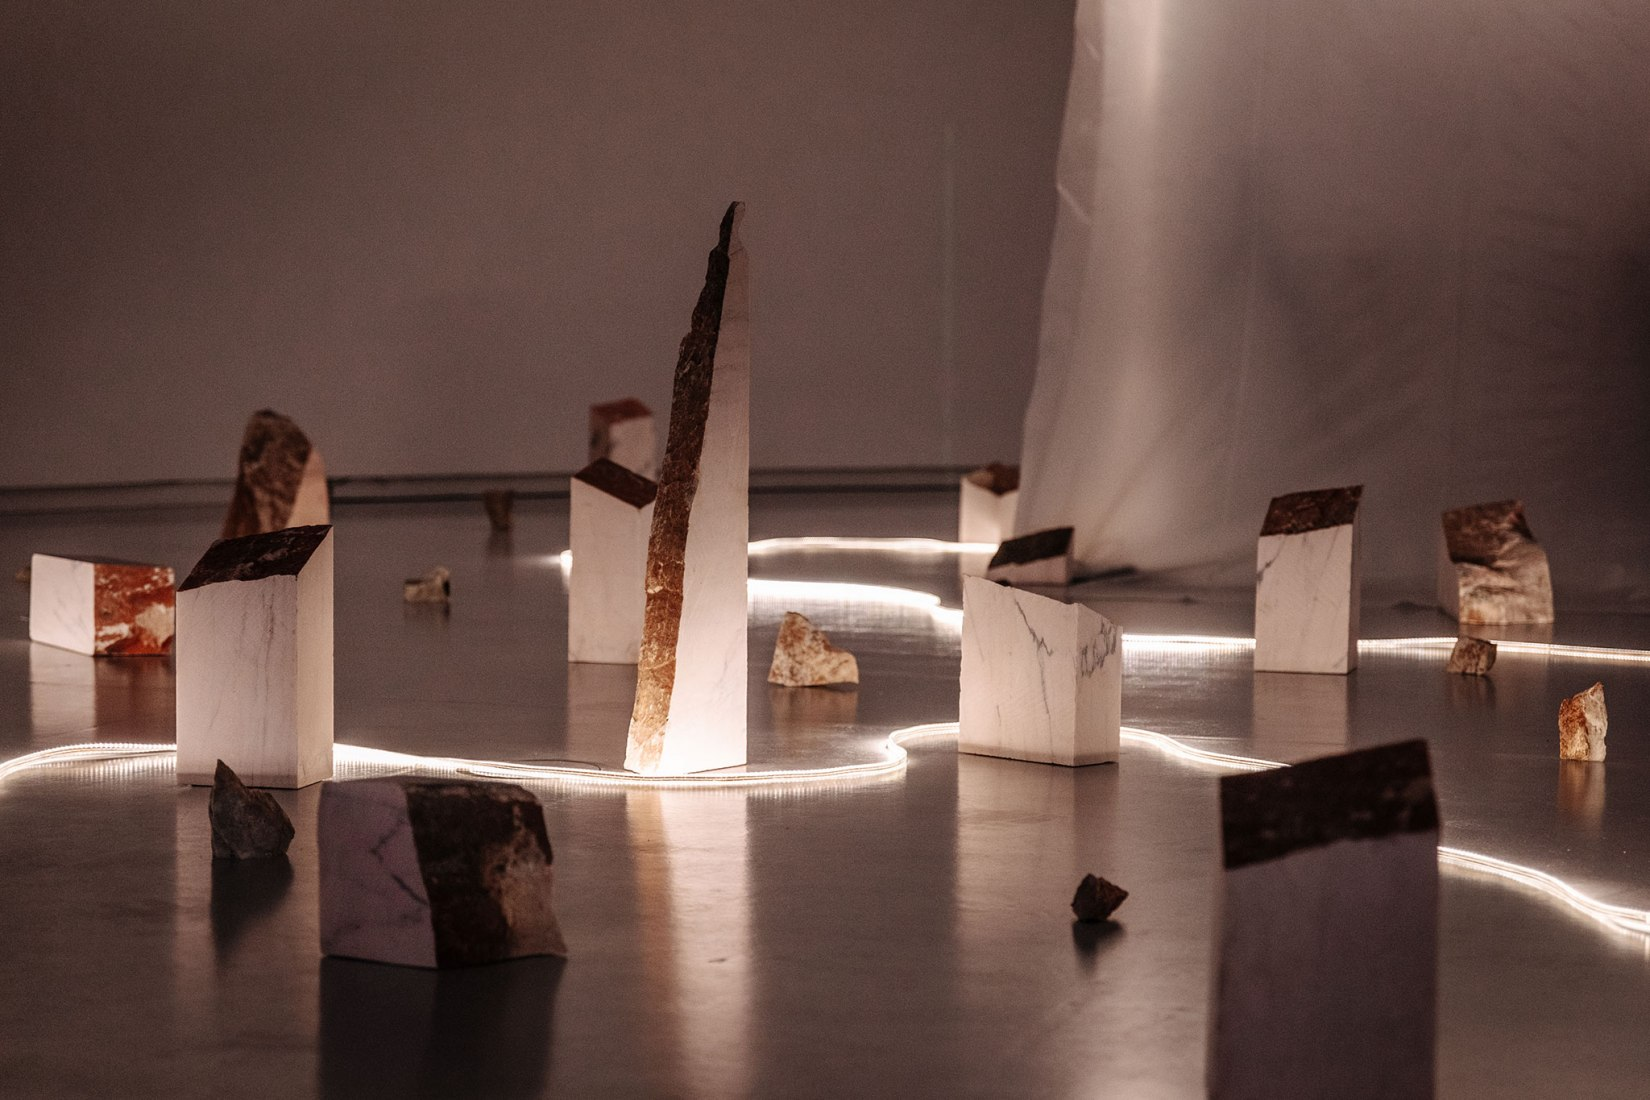 Mush Rooms por BUREAU - Daniel Zamarbide. Fotografía por Francisco Craveiro